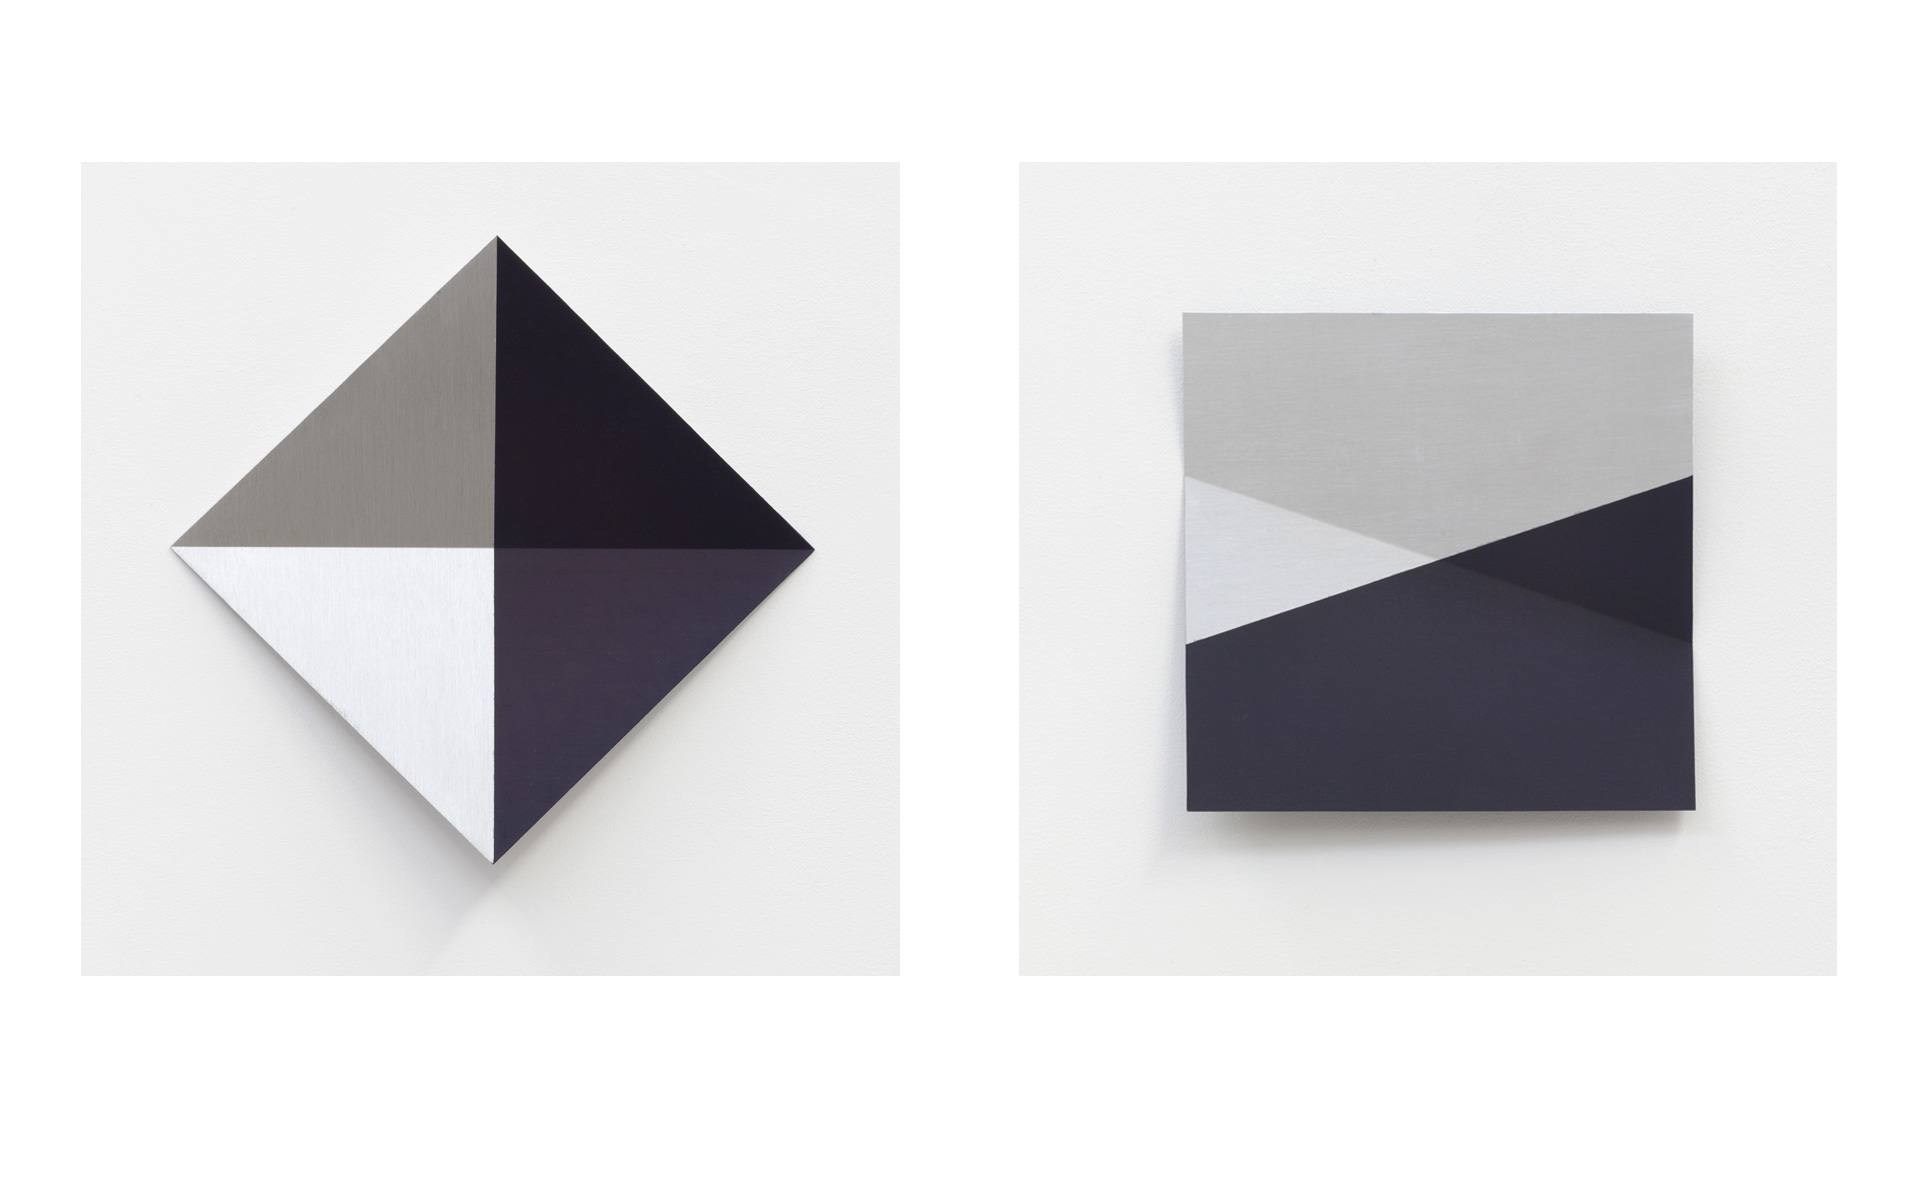 left: O. T. (dunkelblau), 1995 Acrylic on aluminum 42.4 × 42.4 × 5 cm / right: O. T. (violett dunkel), 1995 Acrylic on aluminum 30 × 30 × 5 cm - Photos: Christoph Valentien